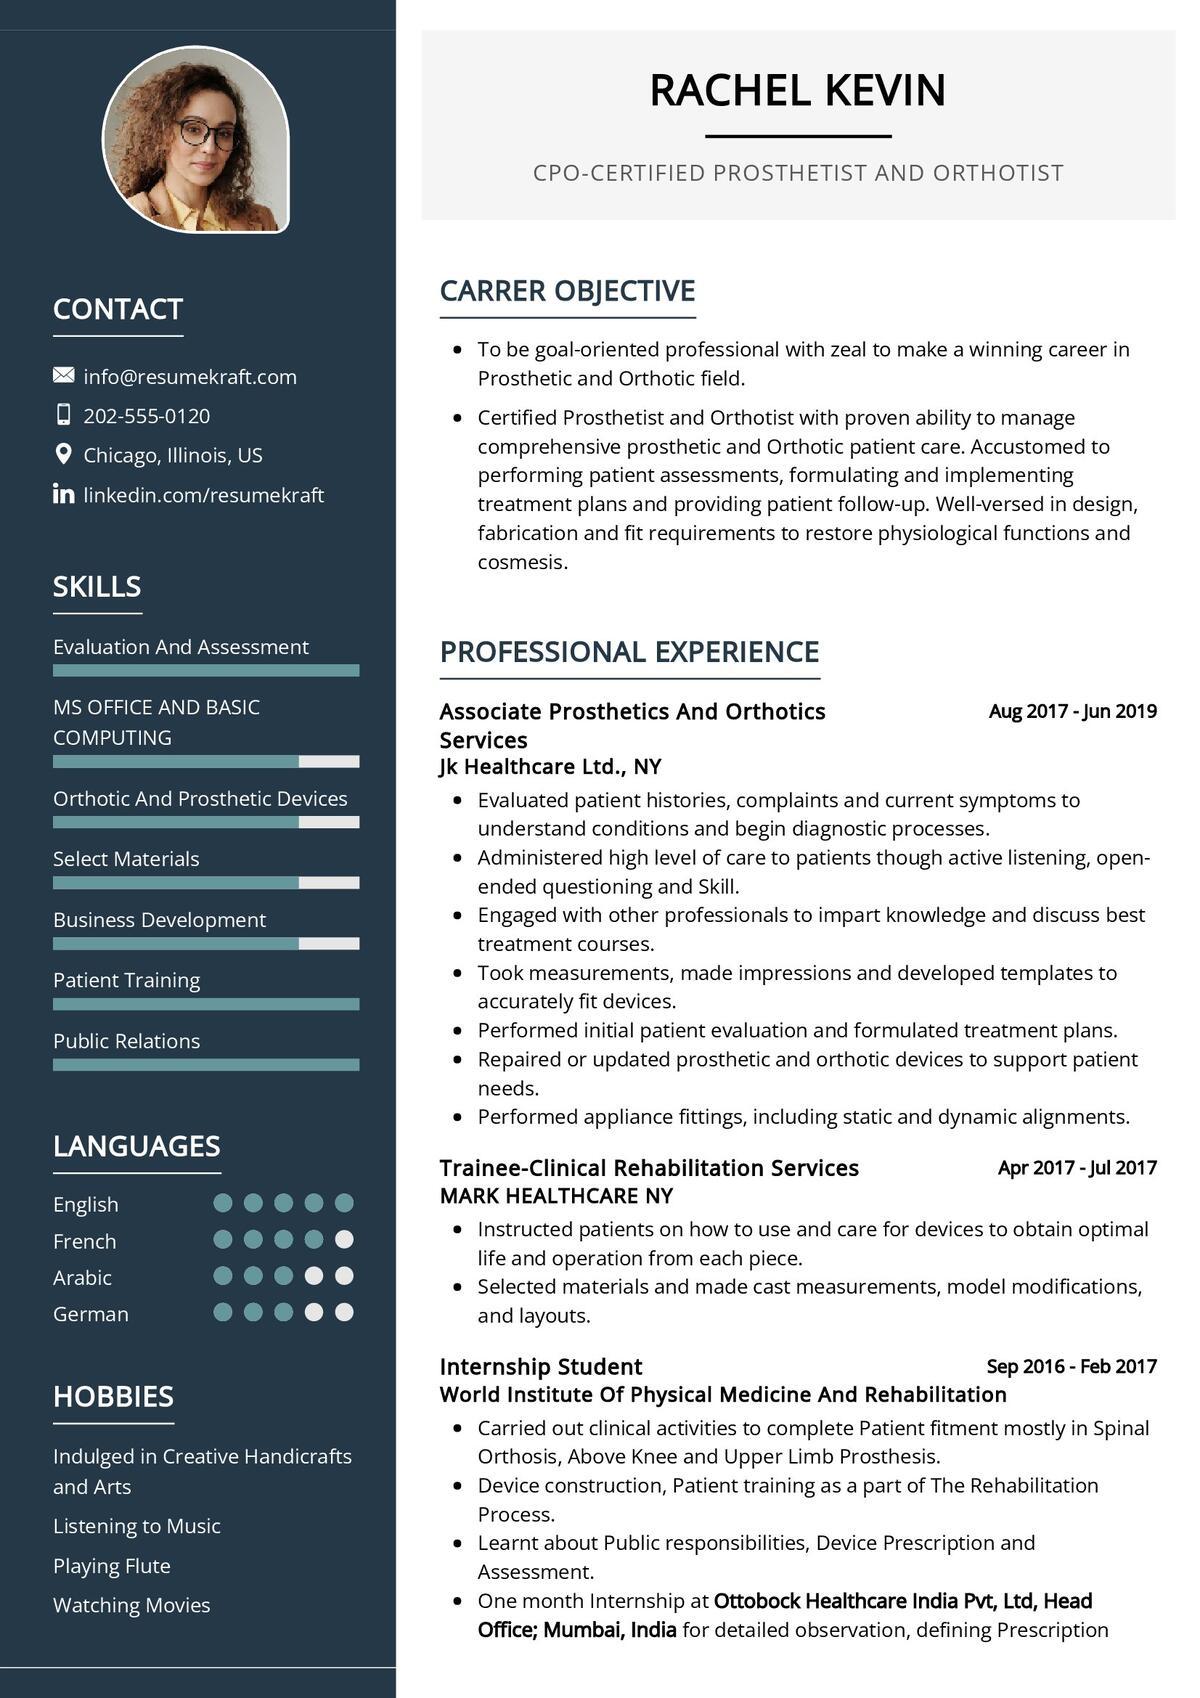 Certified Prosthetist And Orthotist CV Sample